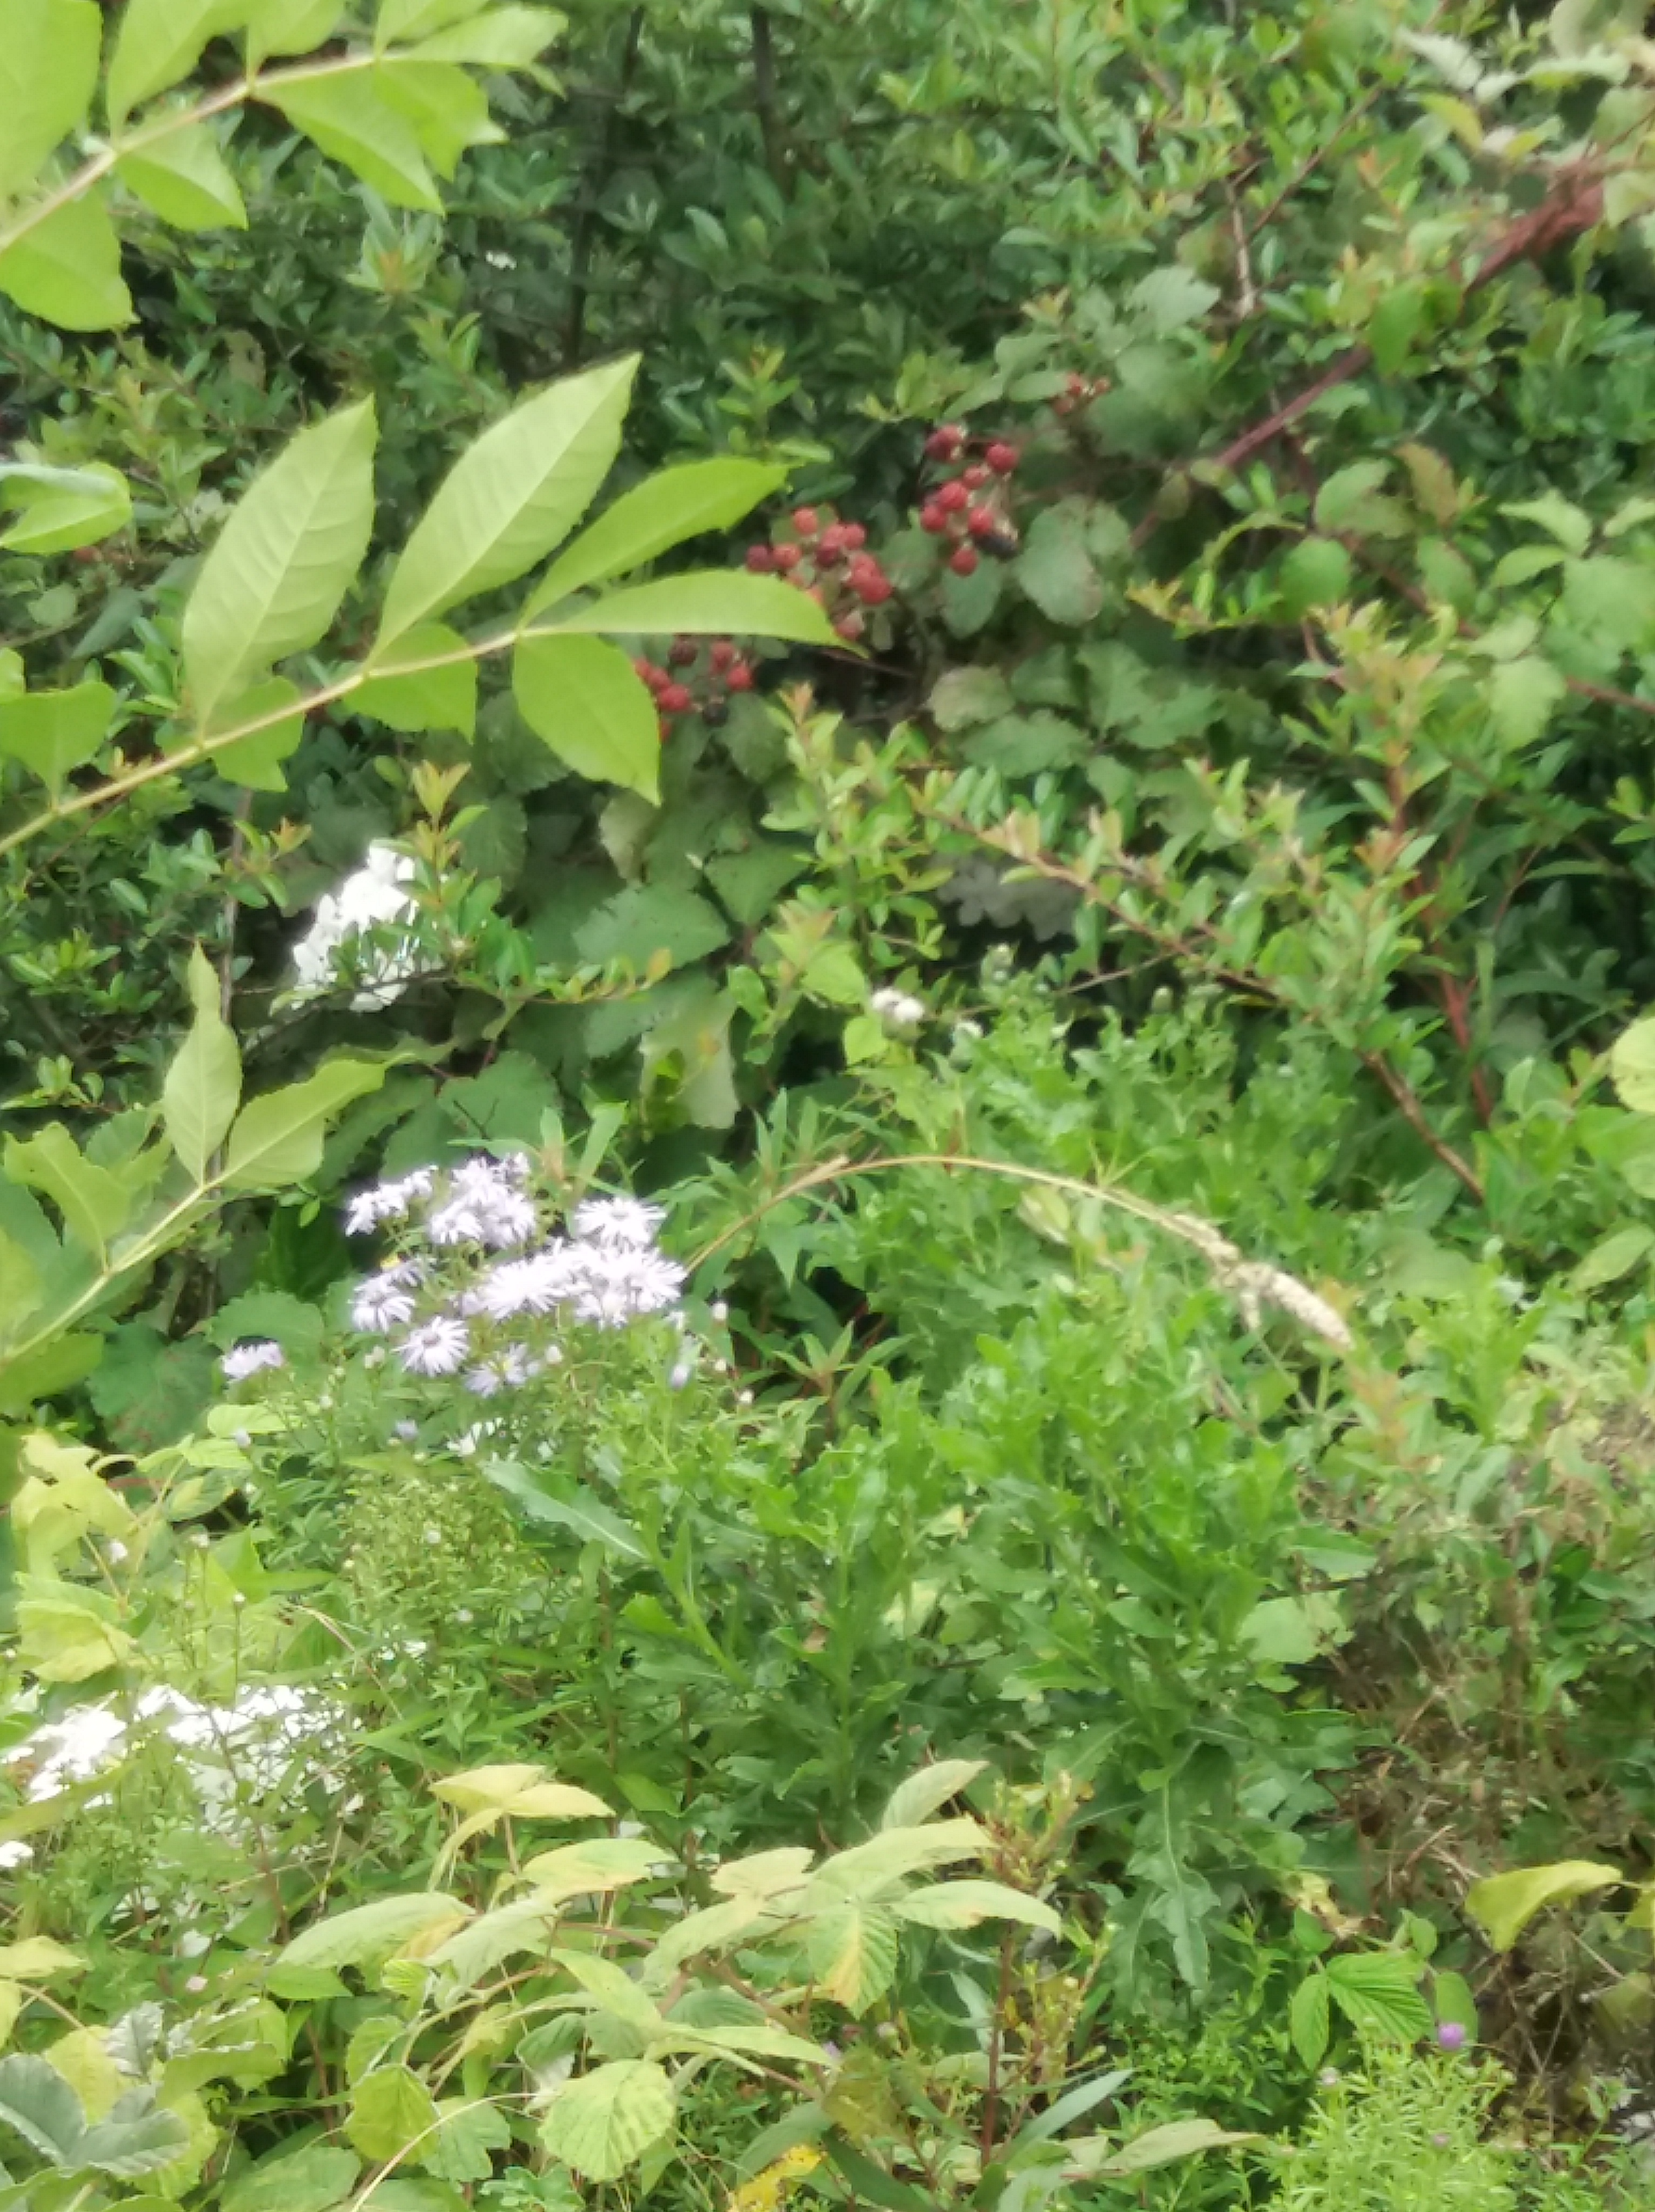 Flowers in God's peaceful garden